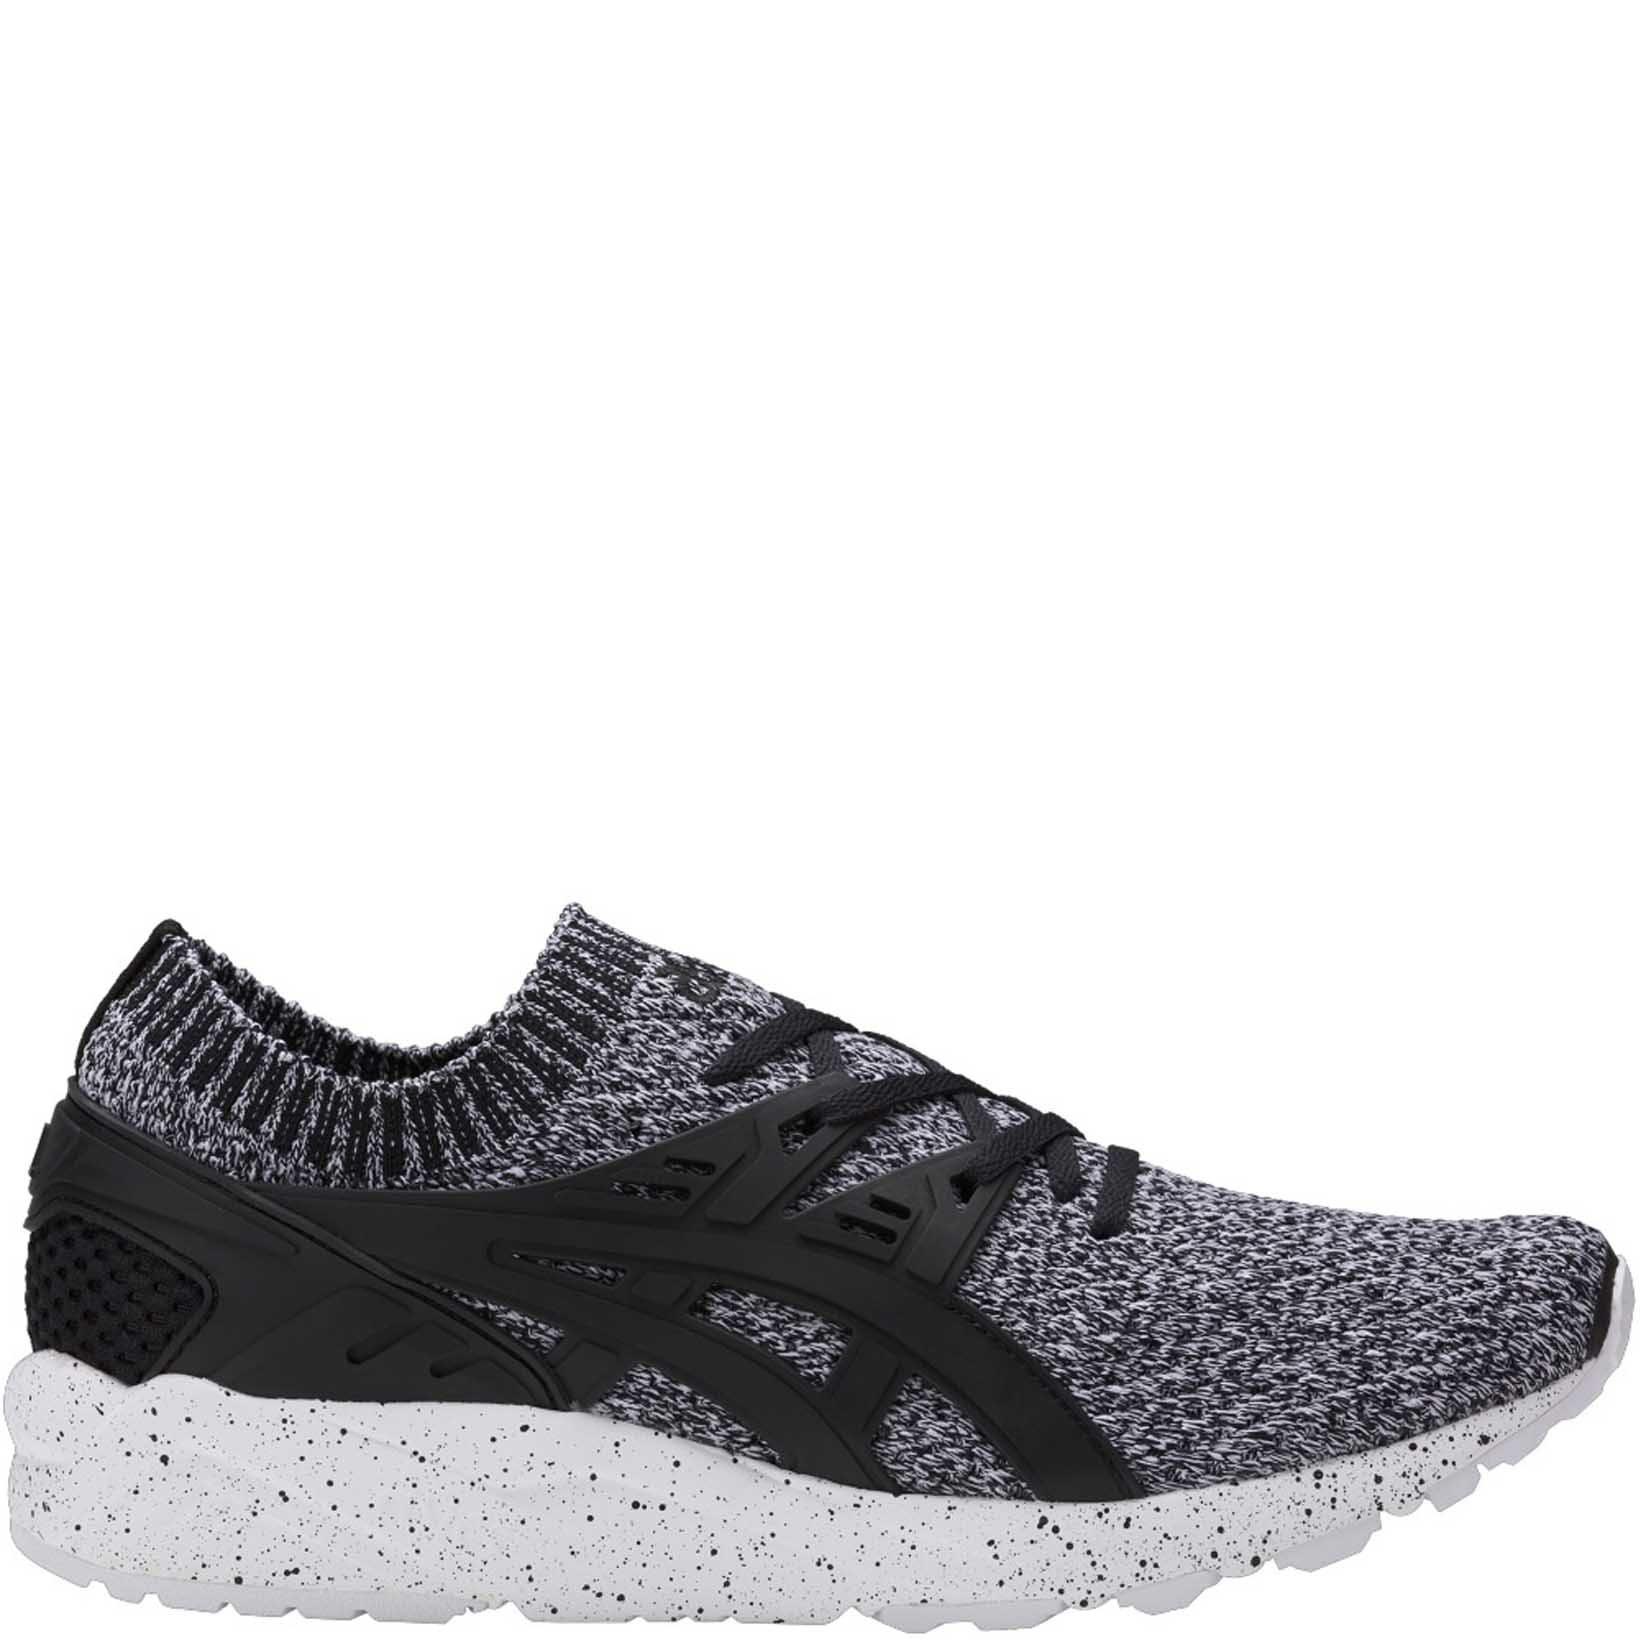 Кроссовки Asics Gel Kayano Trainer Knit, white/black/grey,